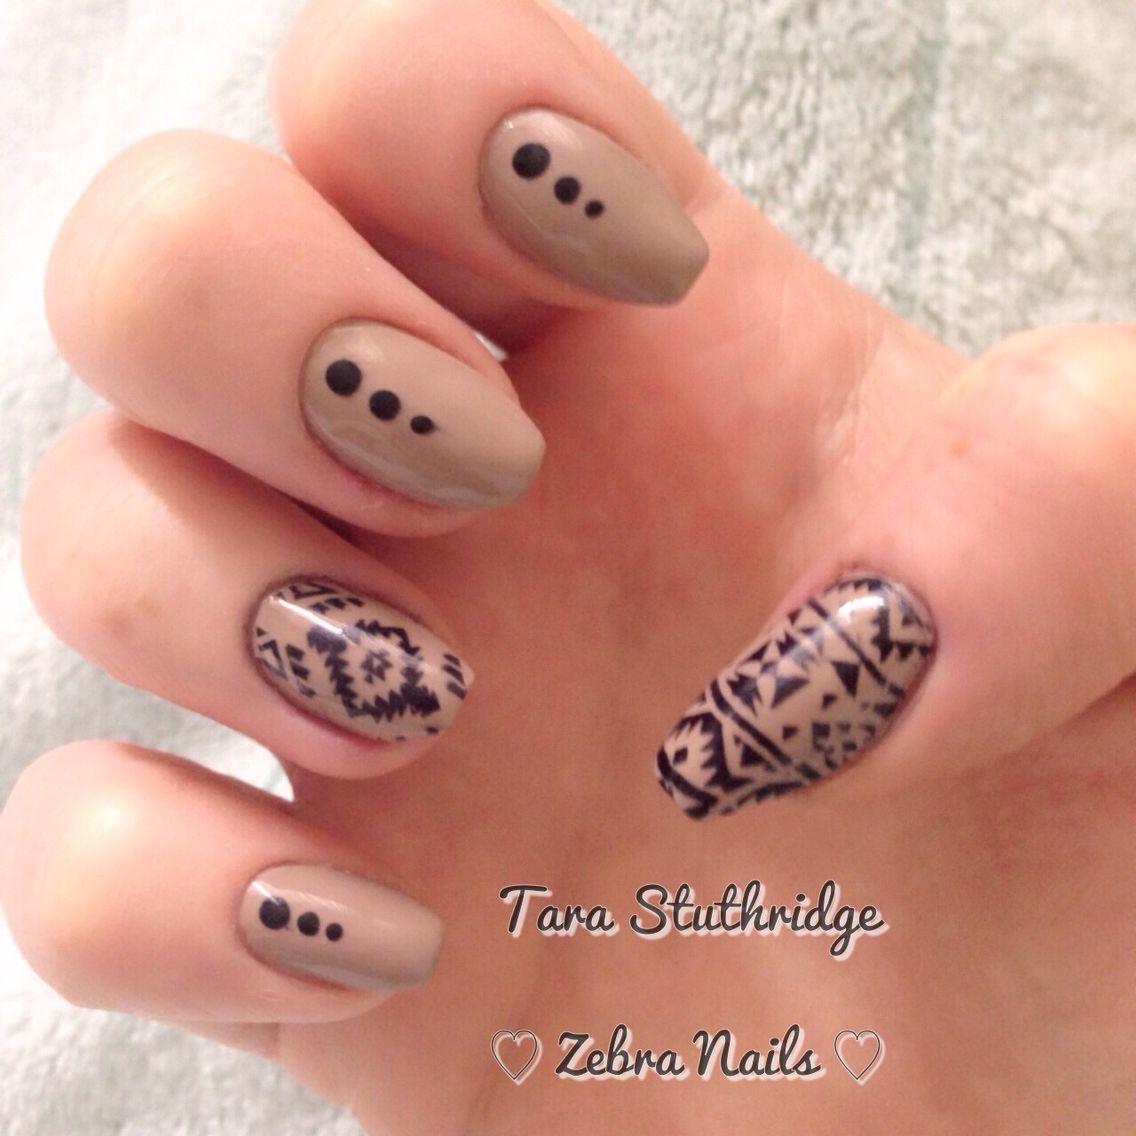 Aztec nude nail art